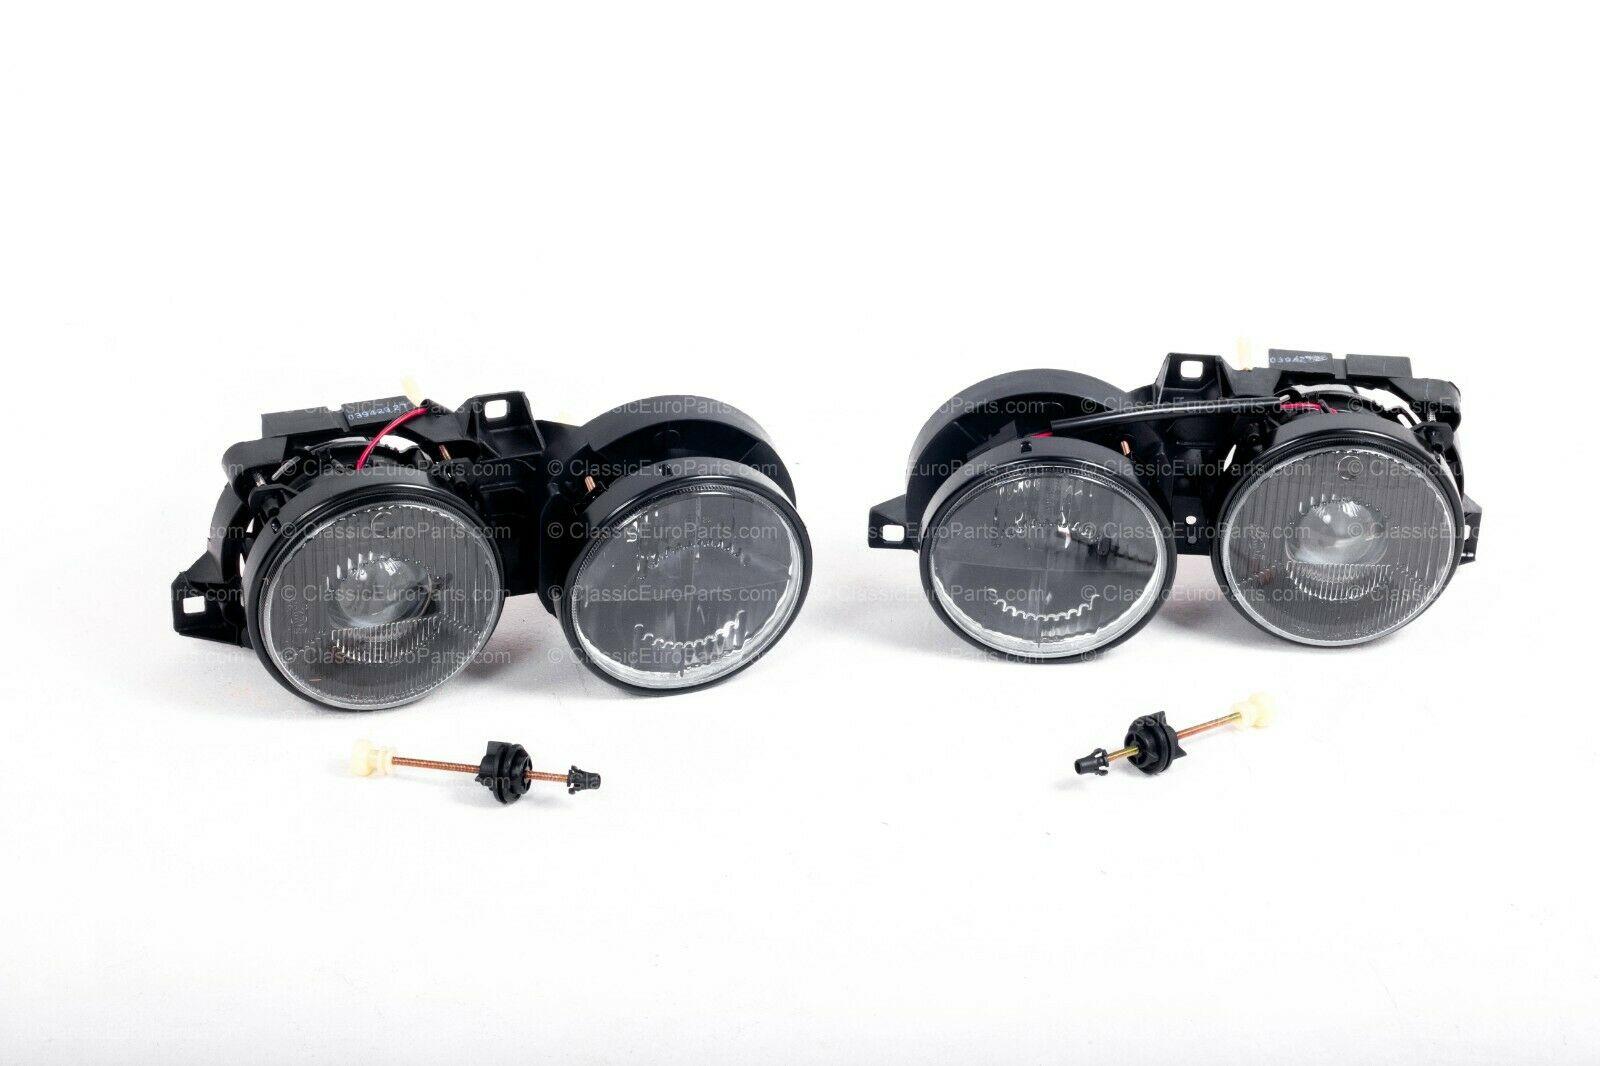 dark euro smiley headlight set for e30 classiceuroparts. Black Bedroom Furniture Sets. Home Design Ideas